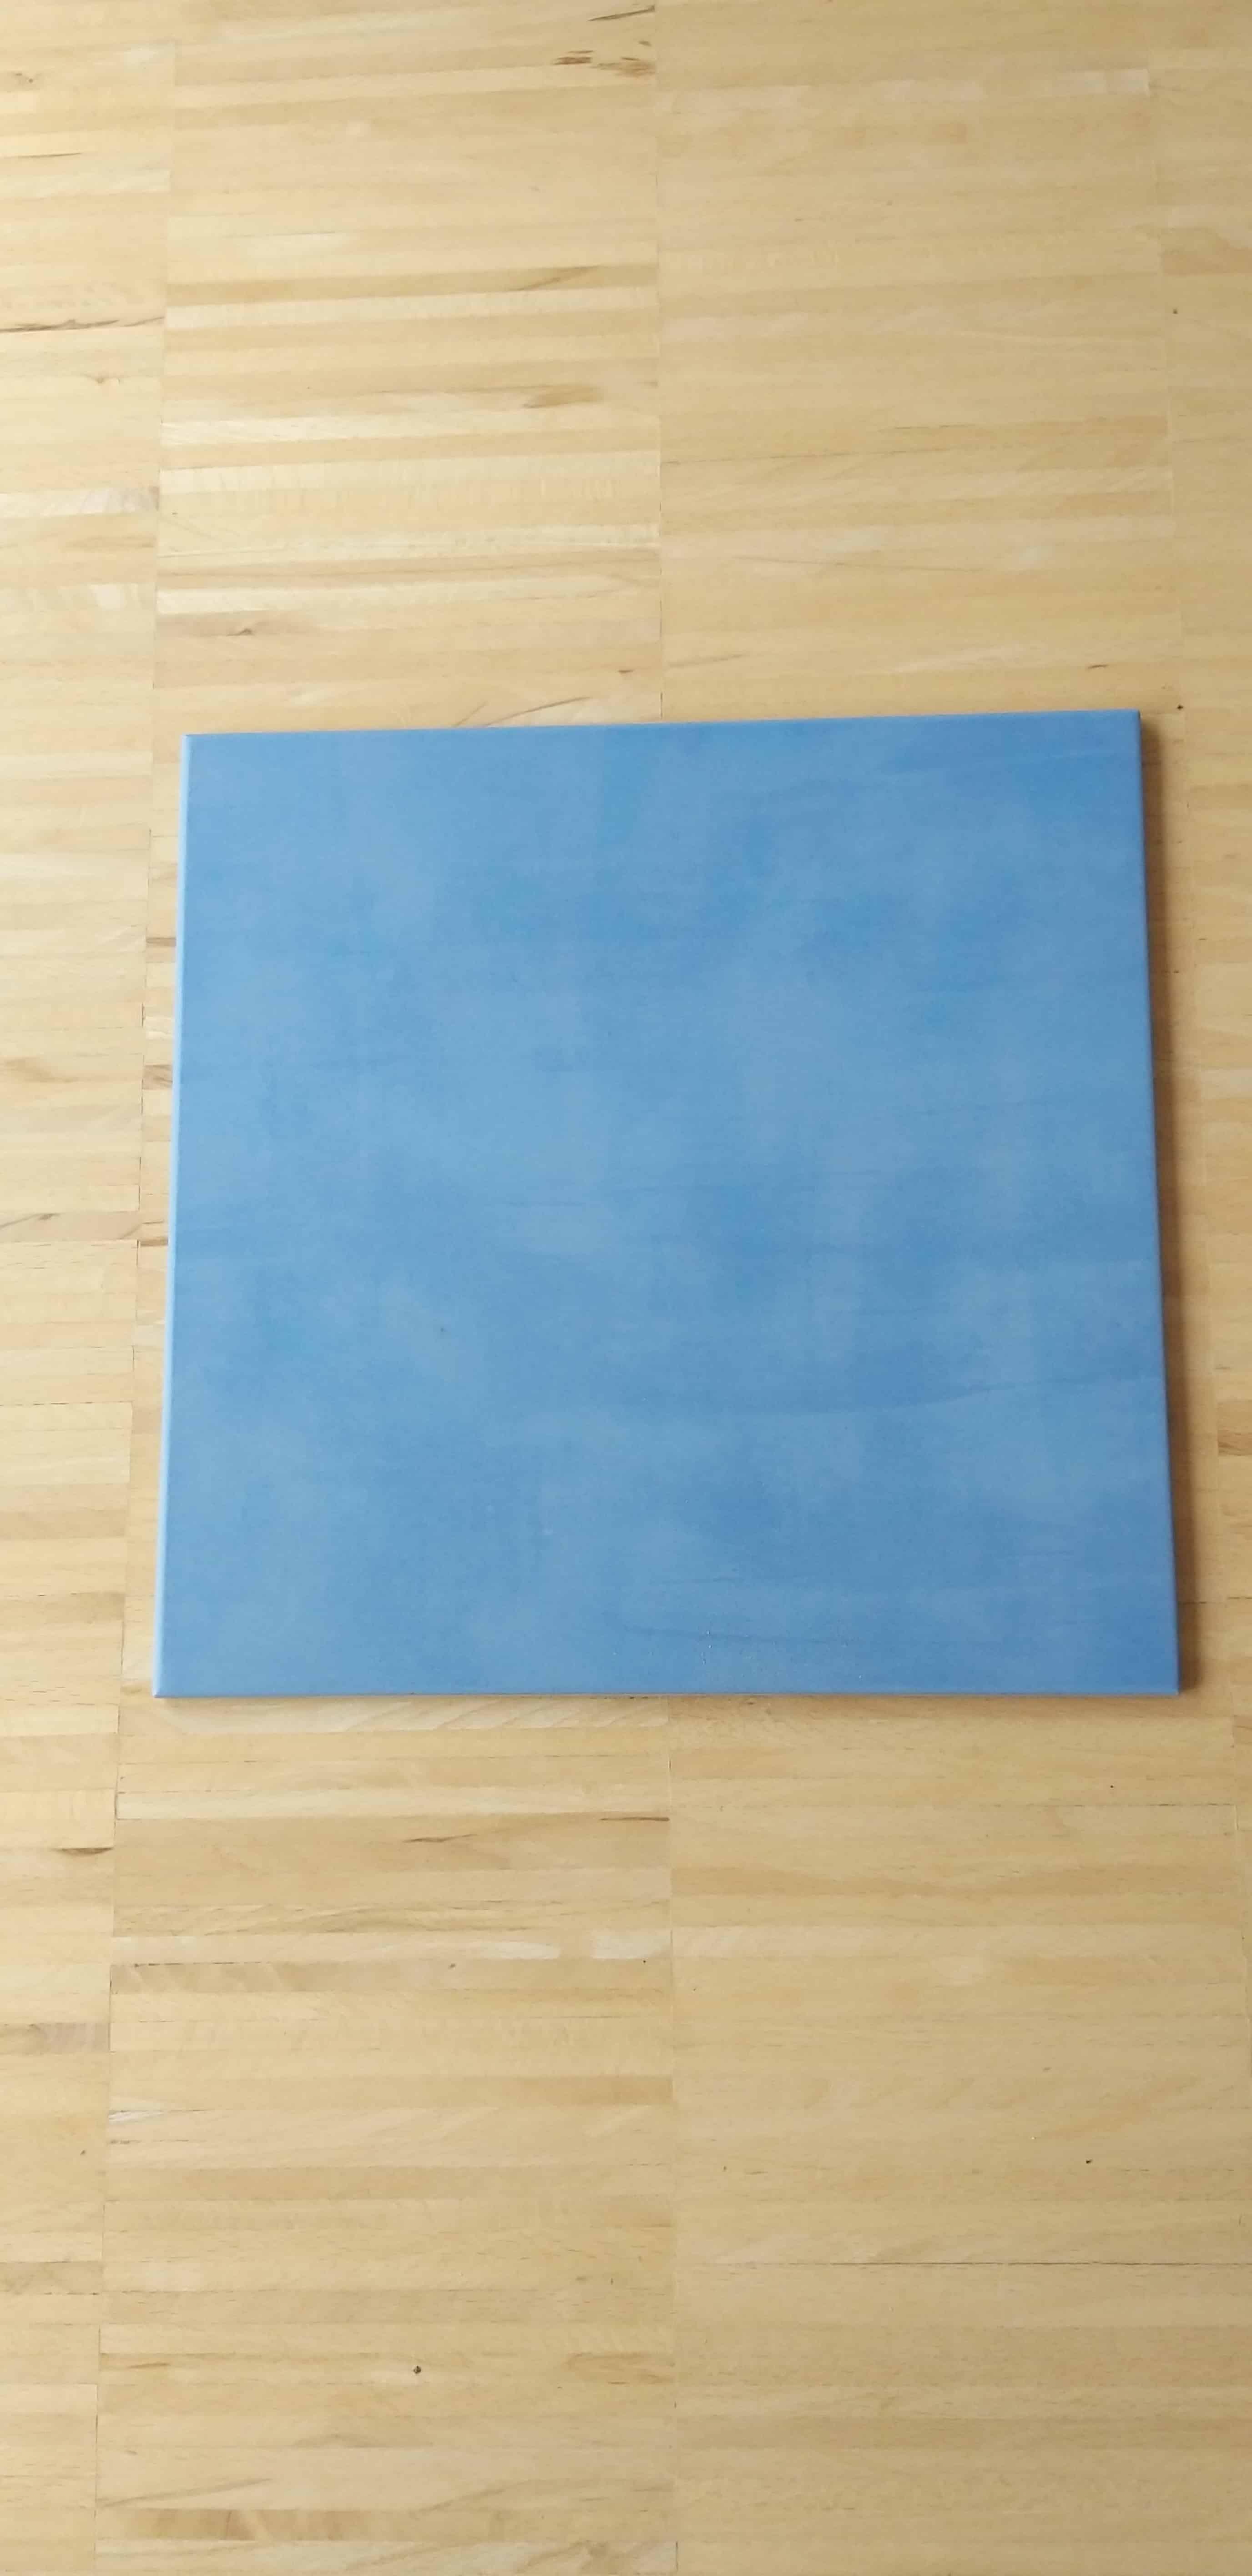 Bodenfliese Villeroy & Boch 3216 FJ48 Funny Day blau 30 x 30 cm